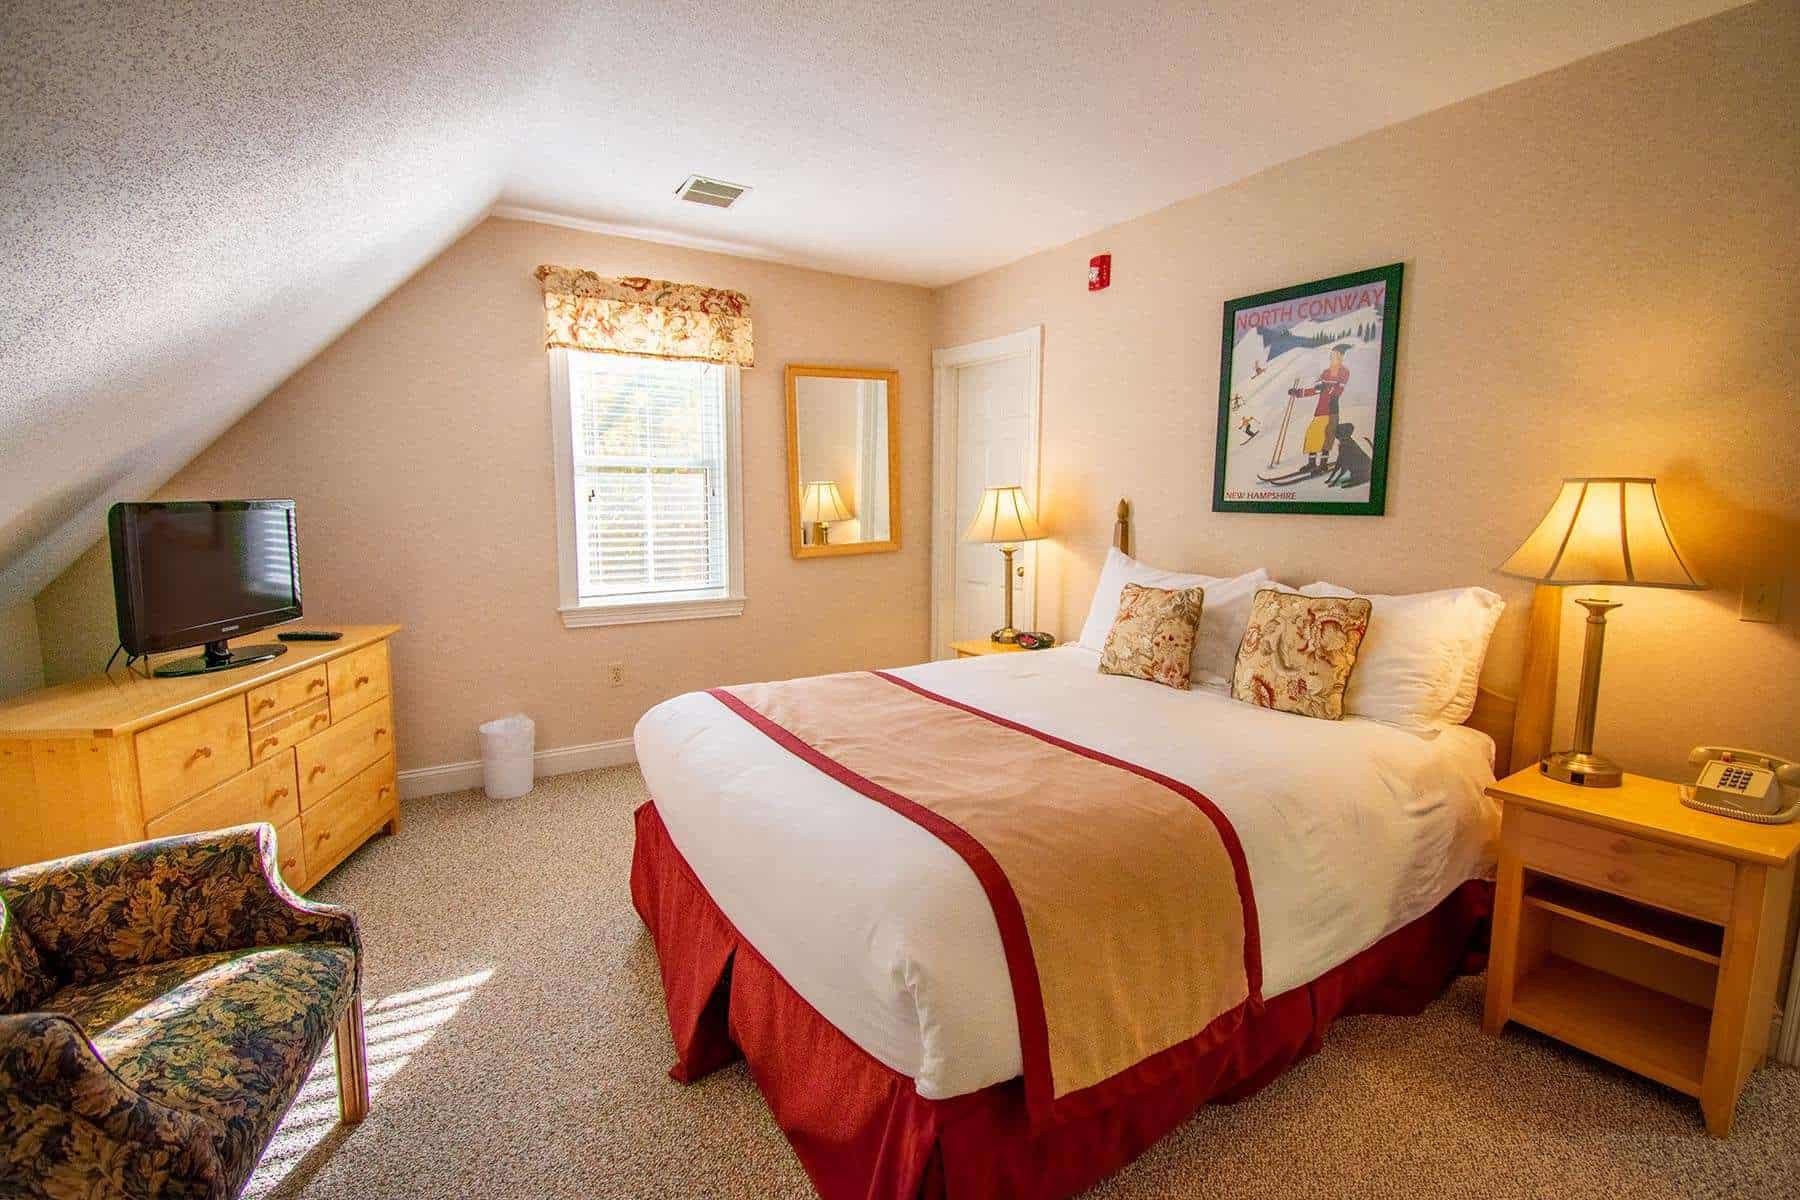 4 Bedroom townhouse ECH2